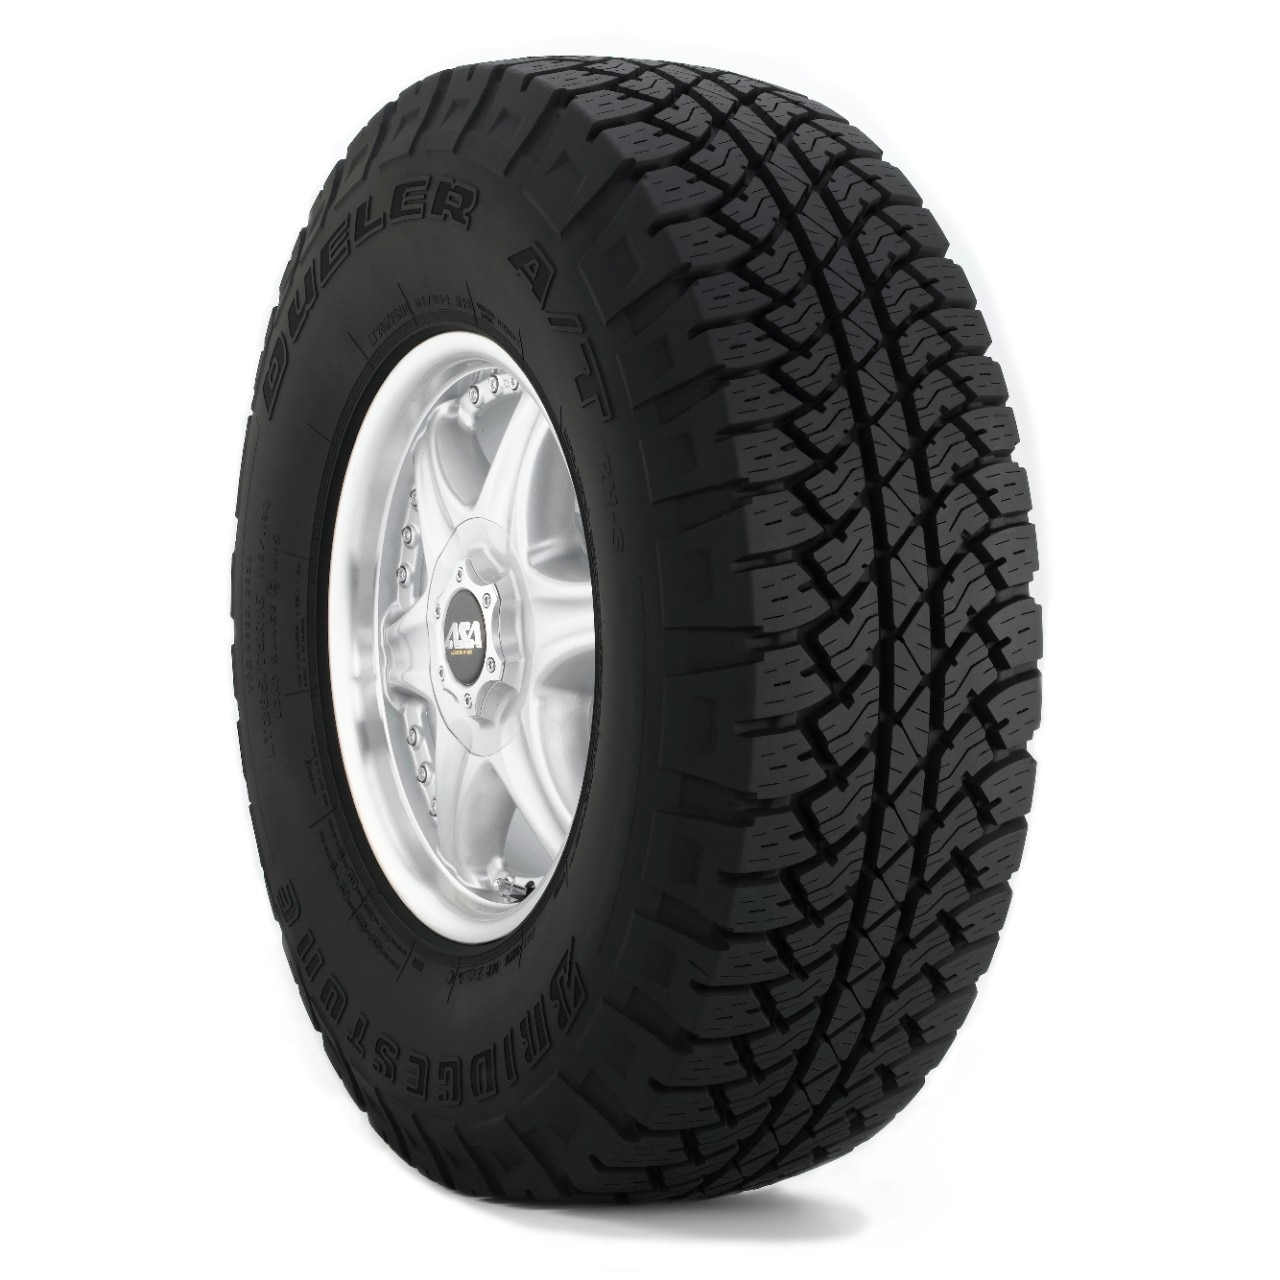 Tire Size Calculator >> Dueler AT RH S   Off-Road Truck Tire   Bridgestone